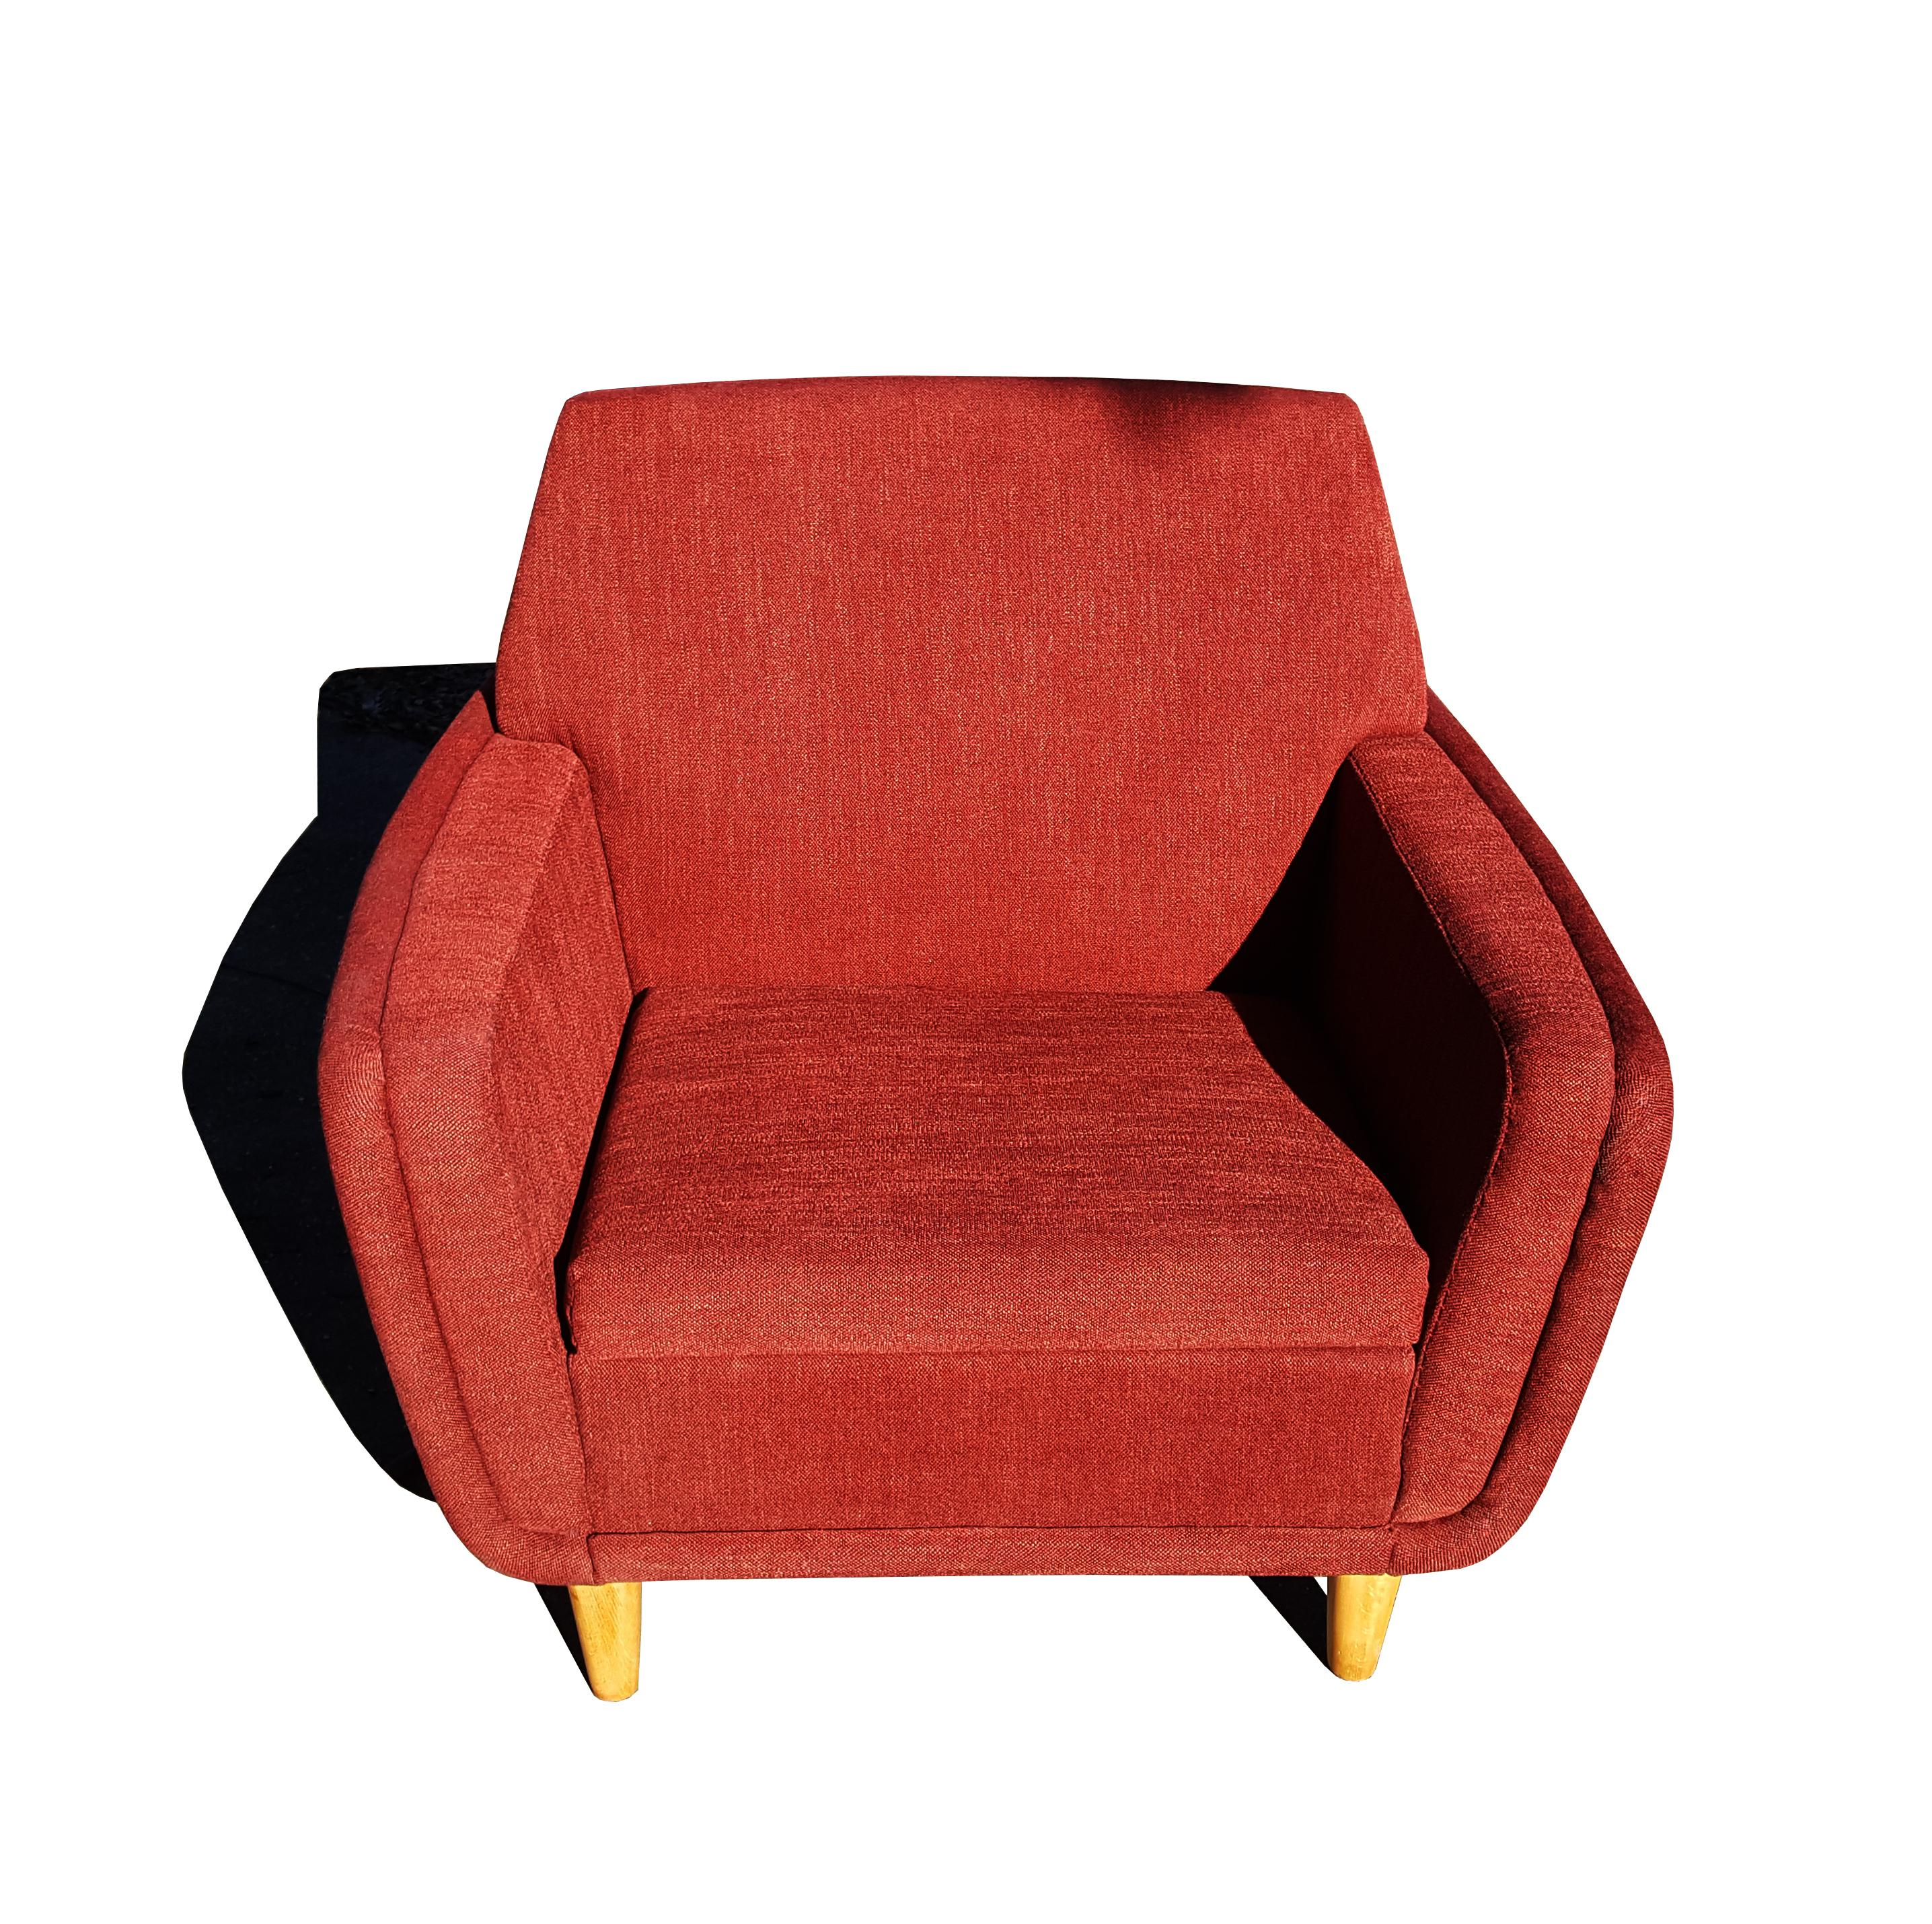 Scandinavian Mid Century Modern Folke Ohlsson For Dux Red Lounge Chair /  Club Chair